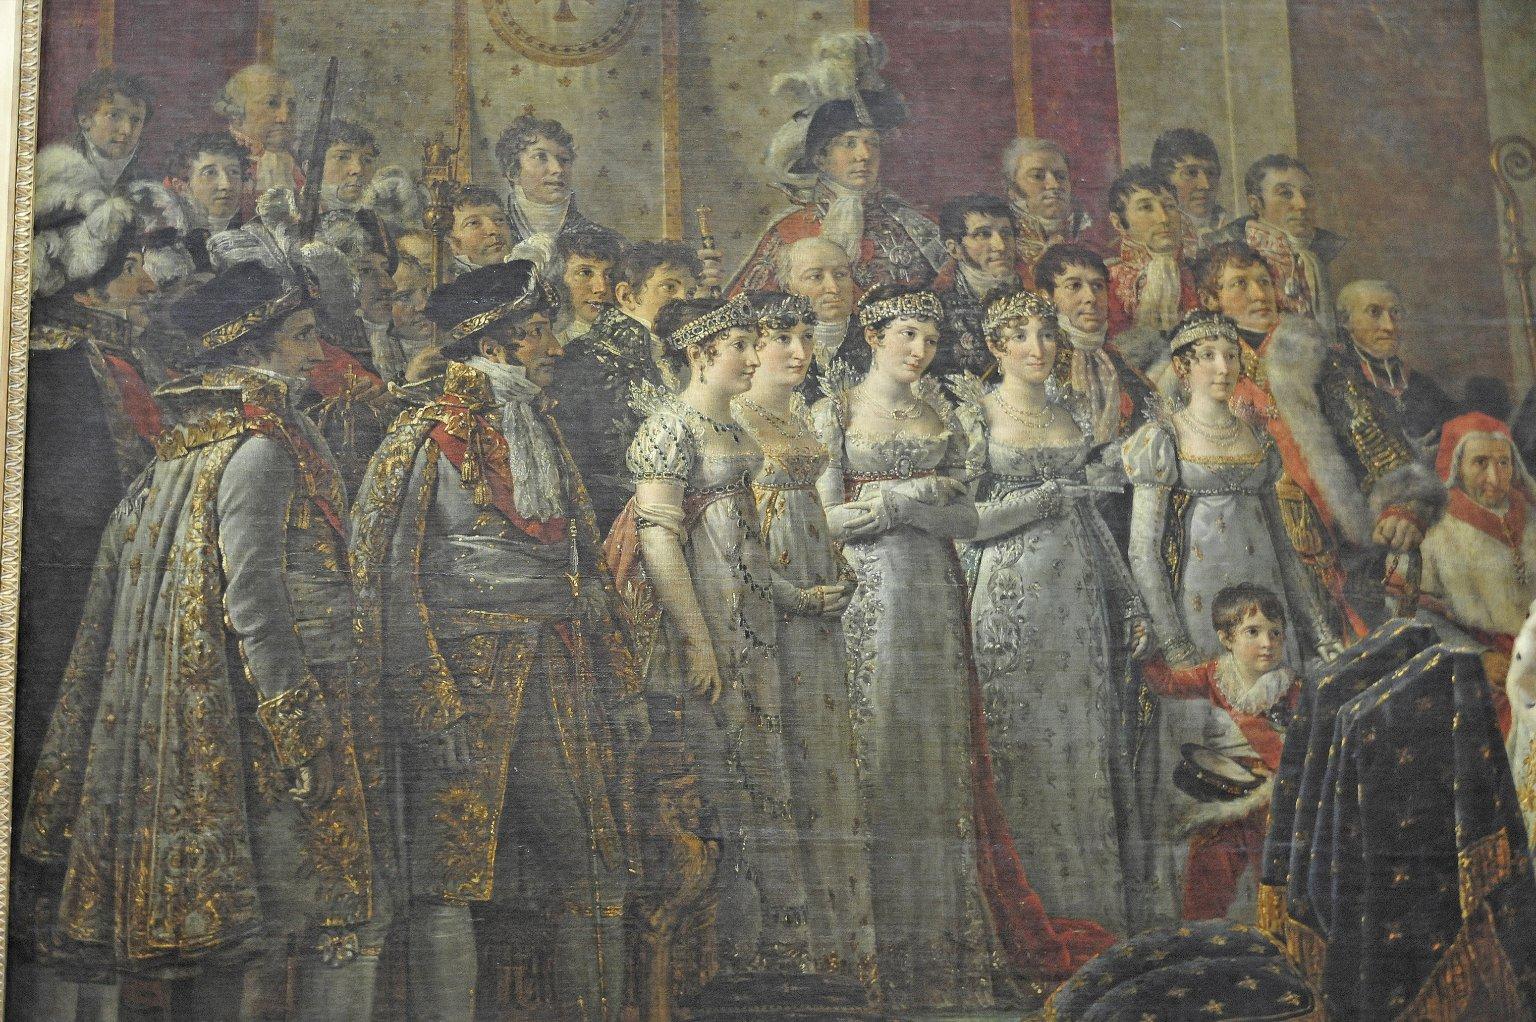 Coronation of Napoleon in Notre-Dame